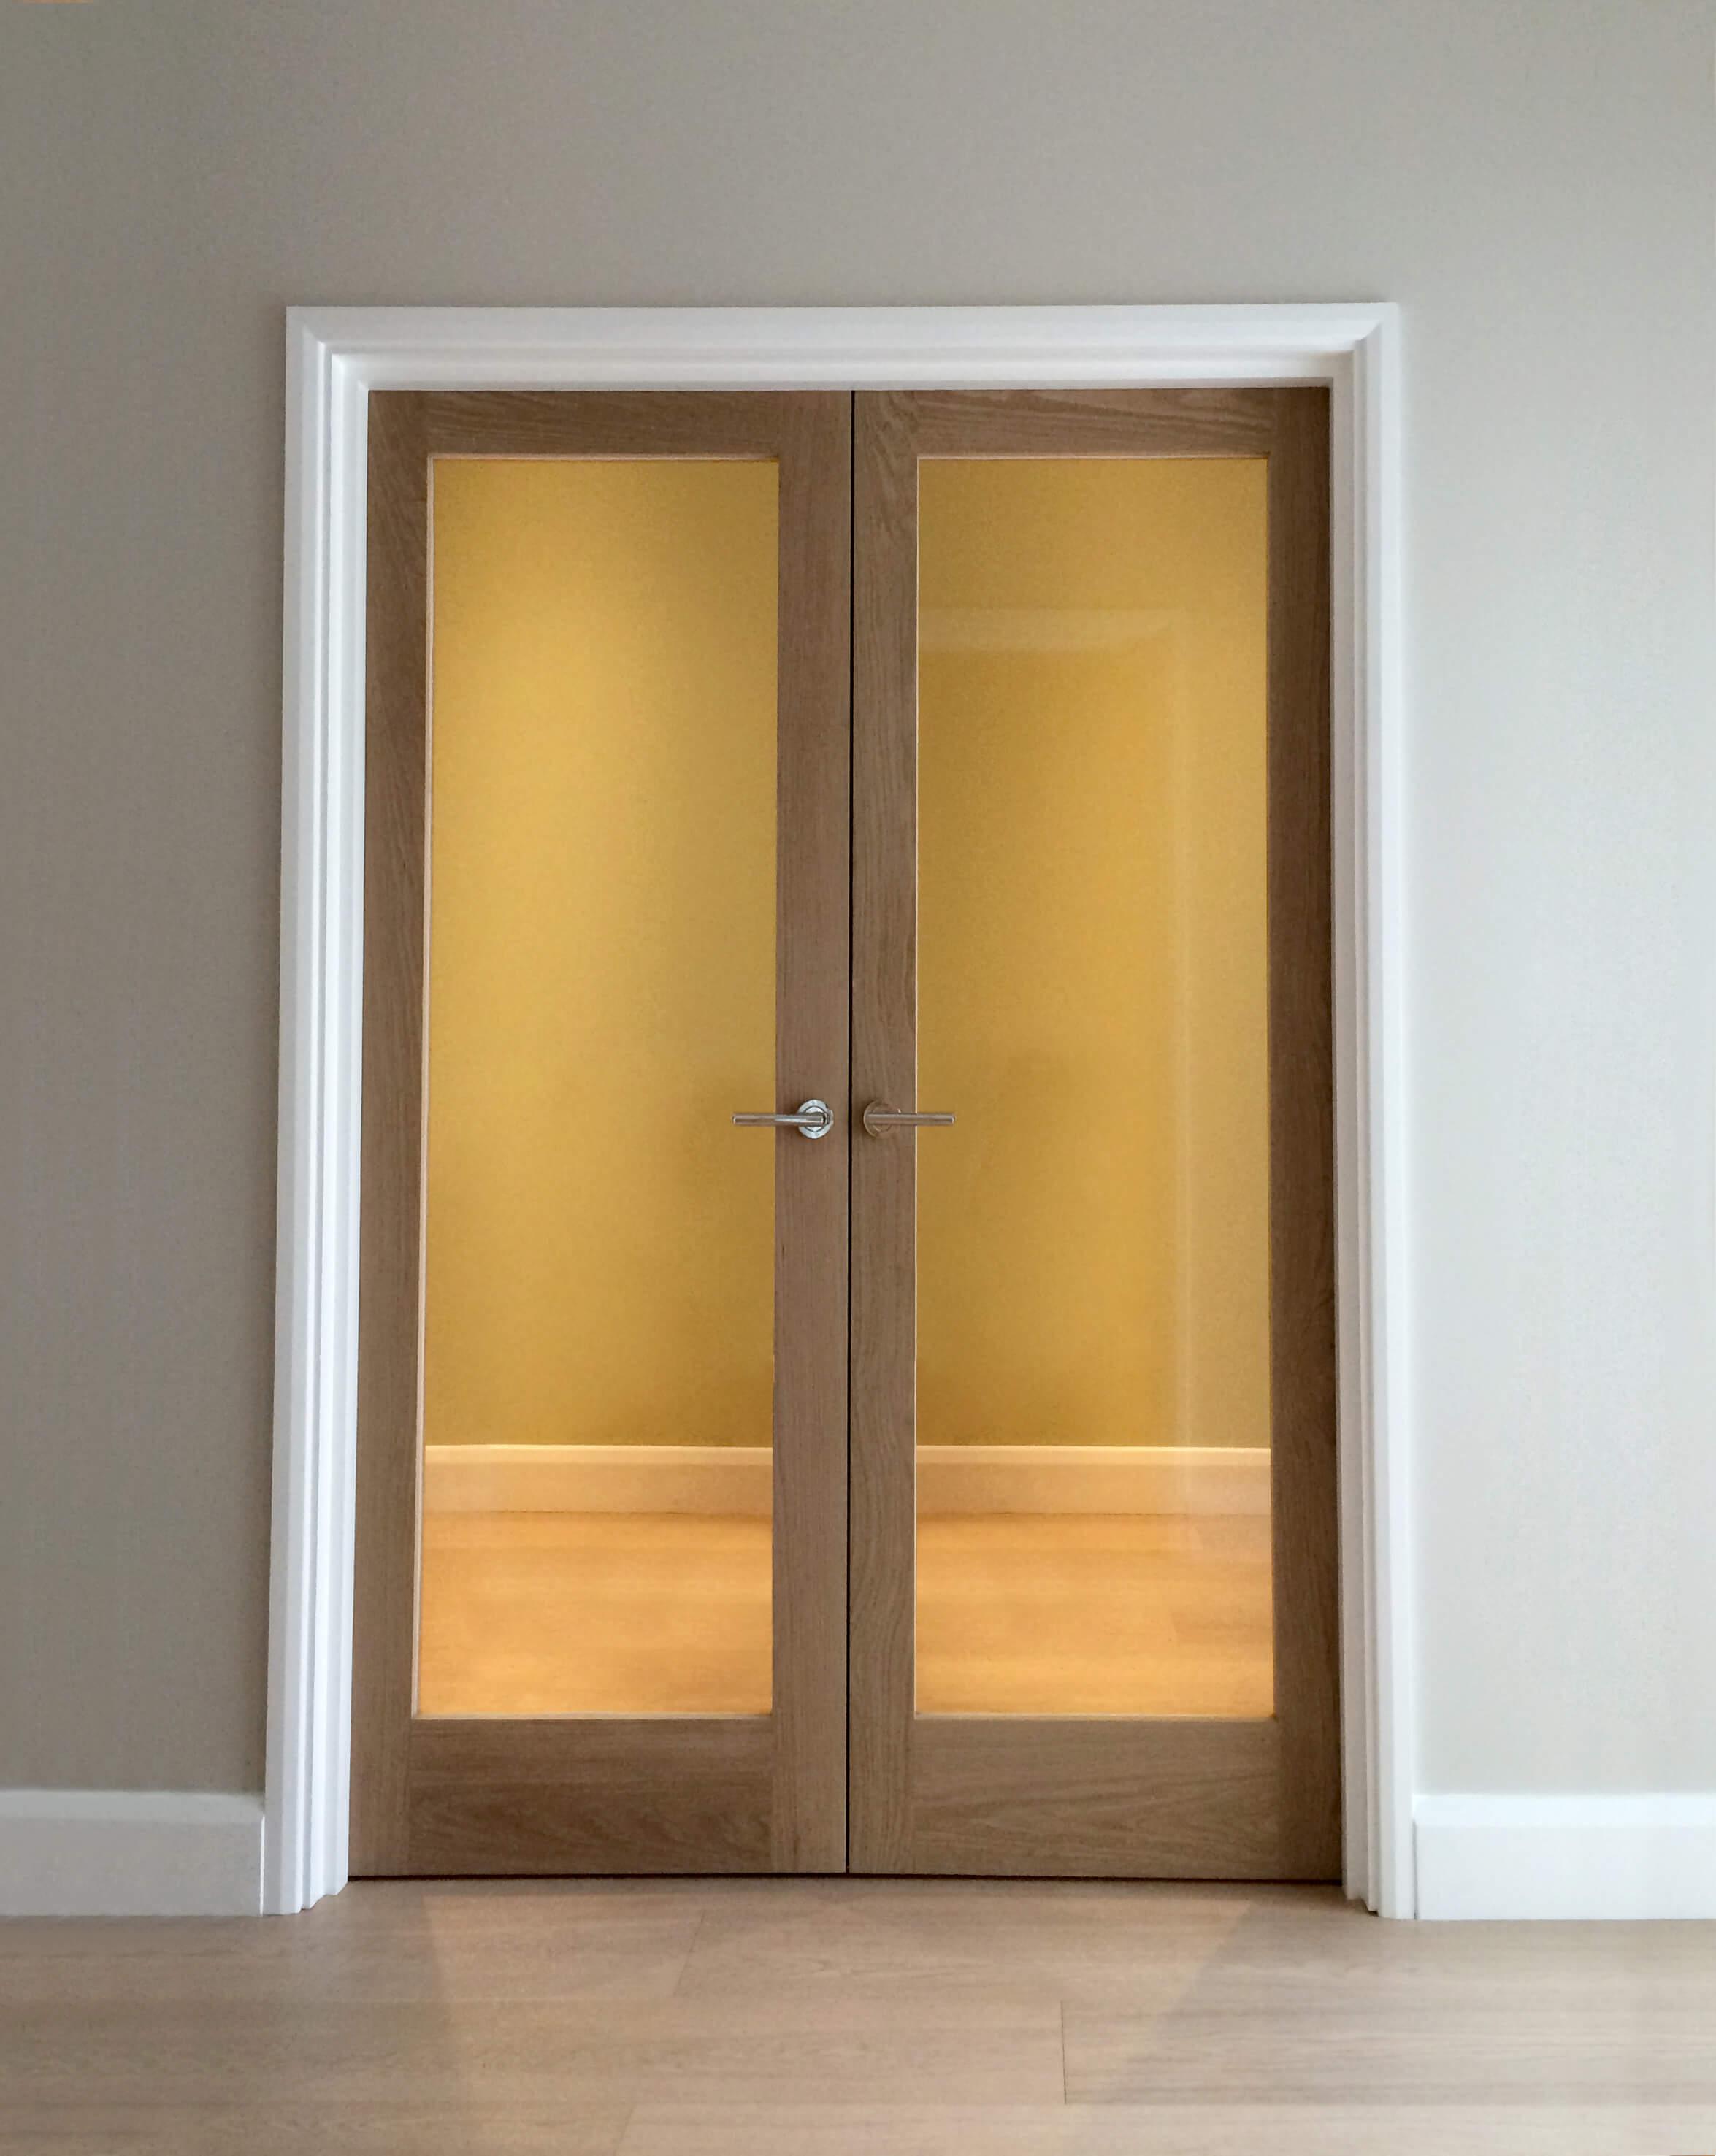 official photos f4f18 5c72c Internal Glazed Double Doors - London Door Company